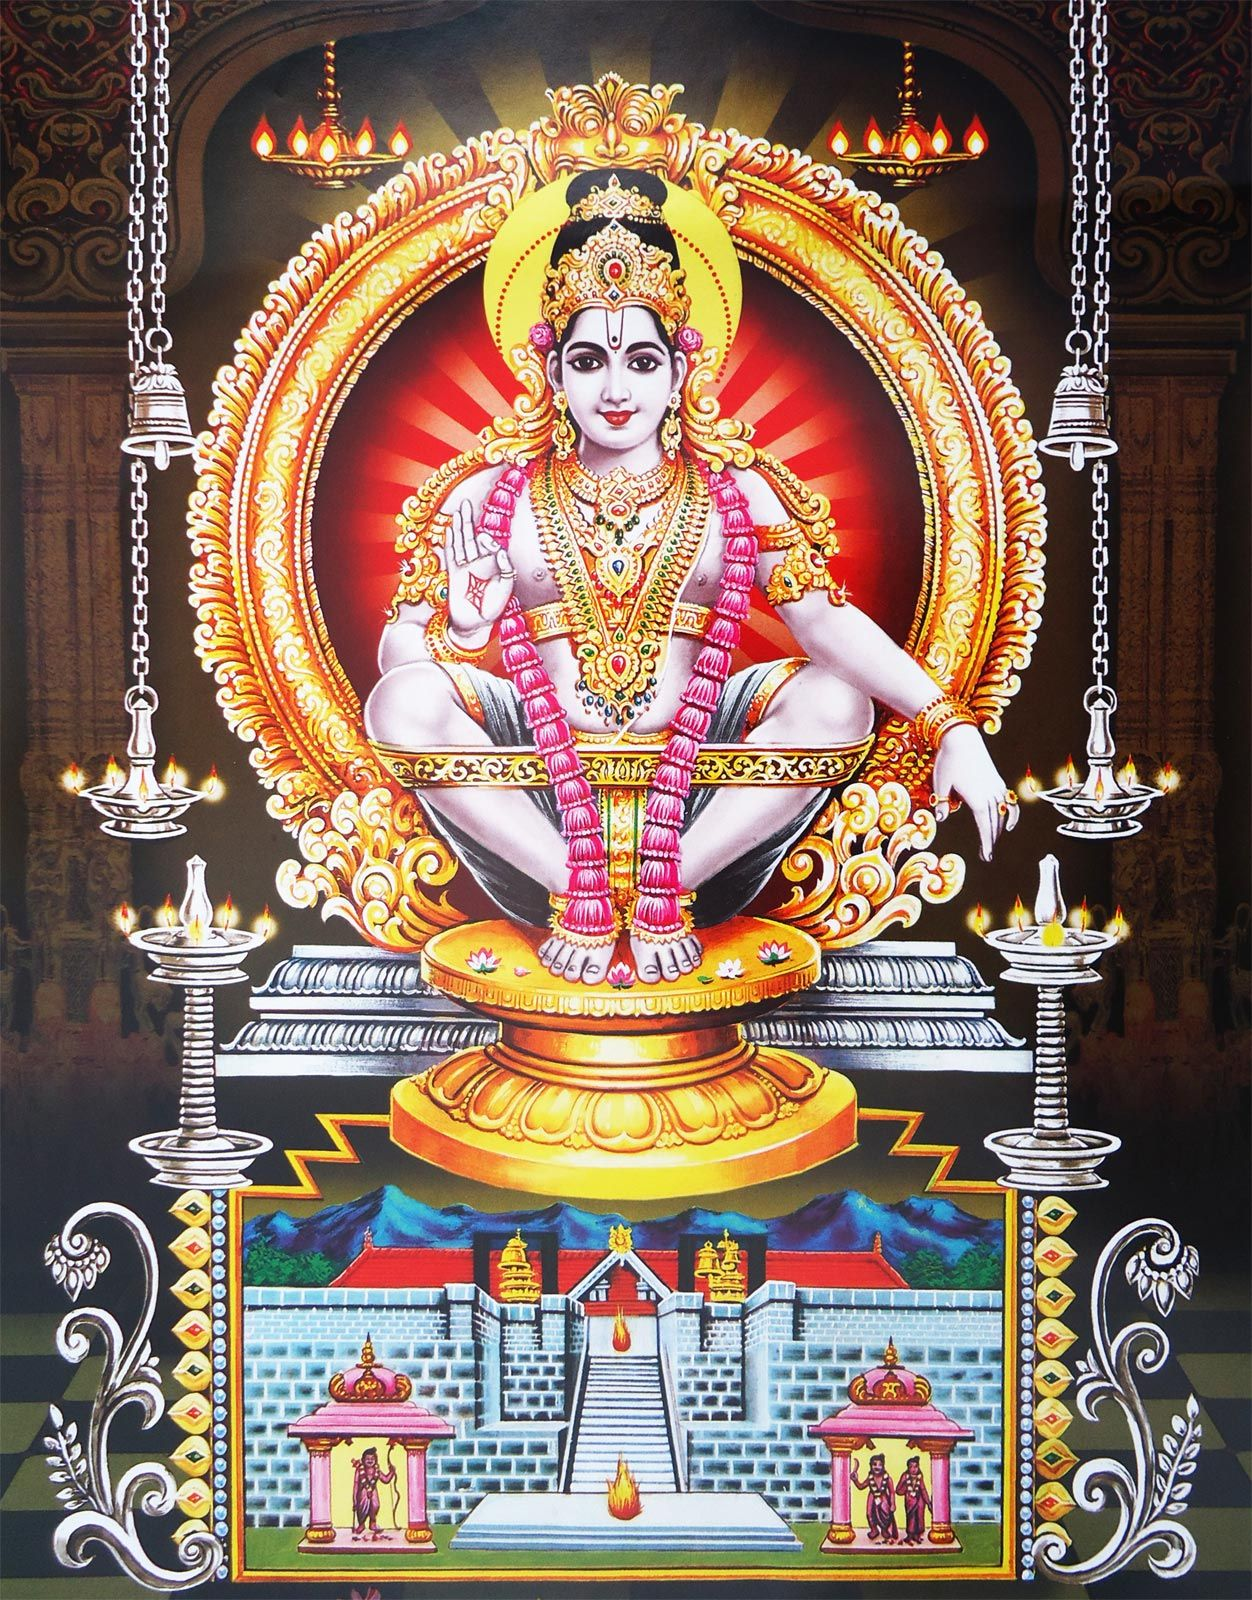 Simple Wallpaper High Quality Lord Ayyappa - b5806efd29c08cd9656236b5907b8566  Gallery_661094.jpg